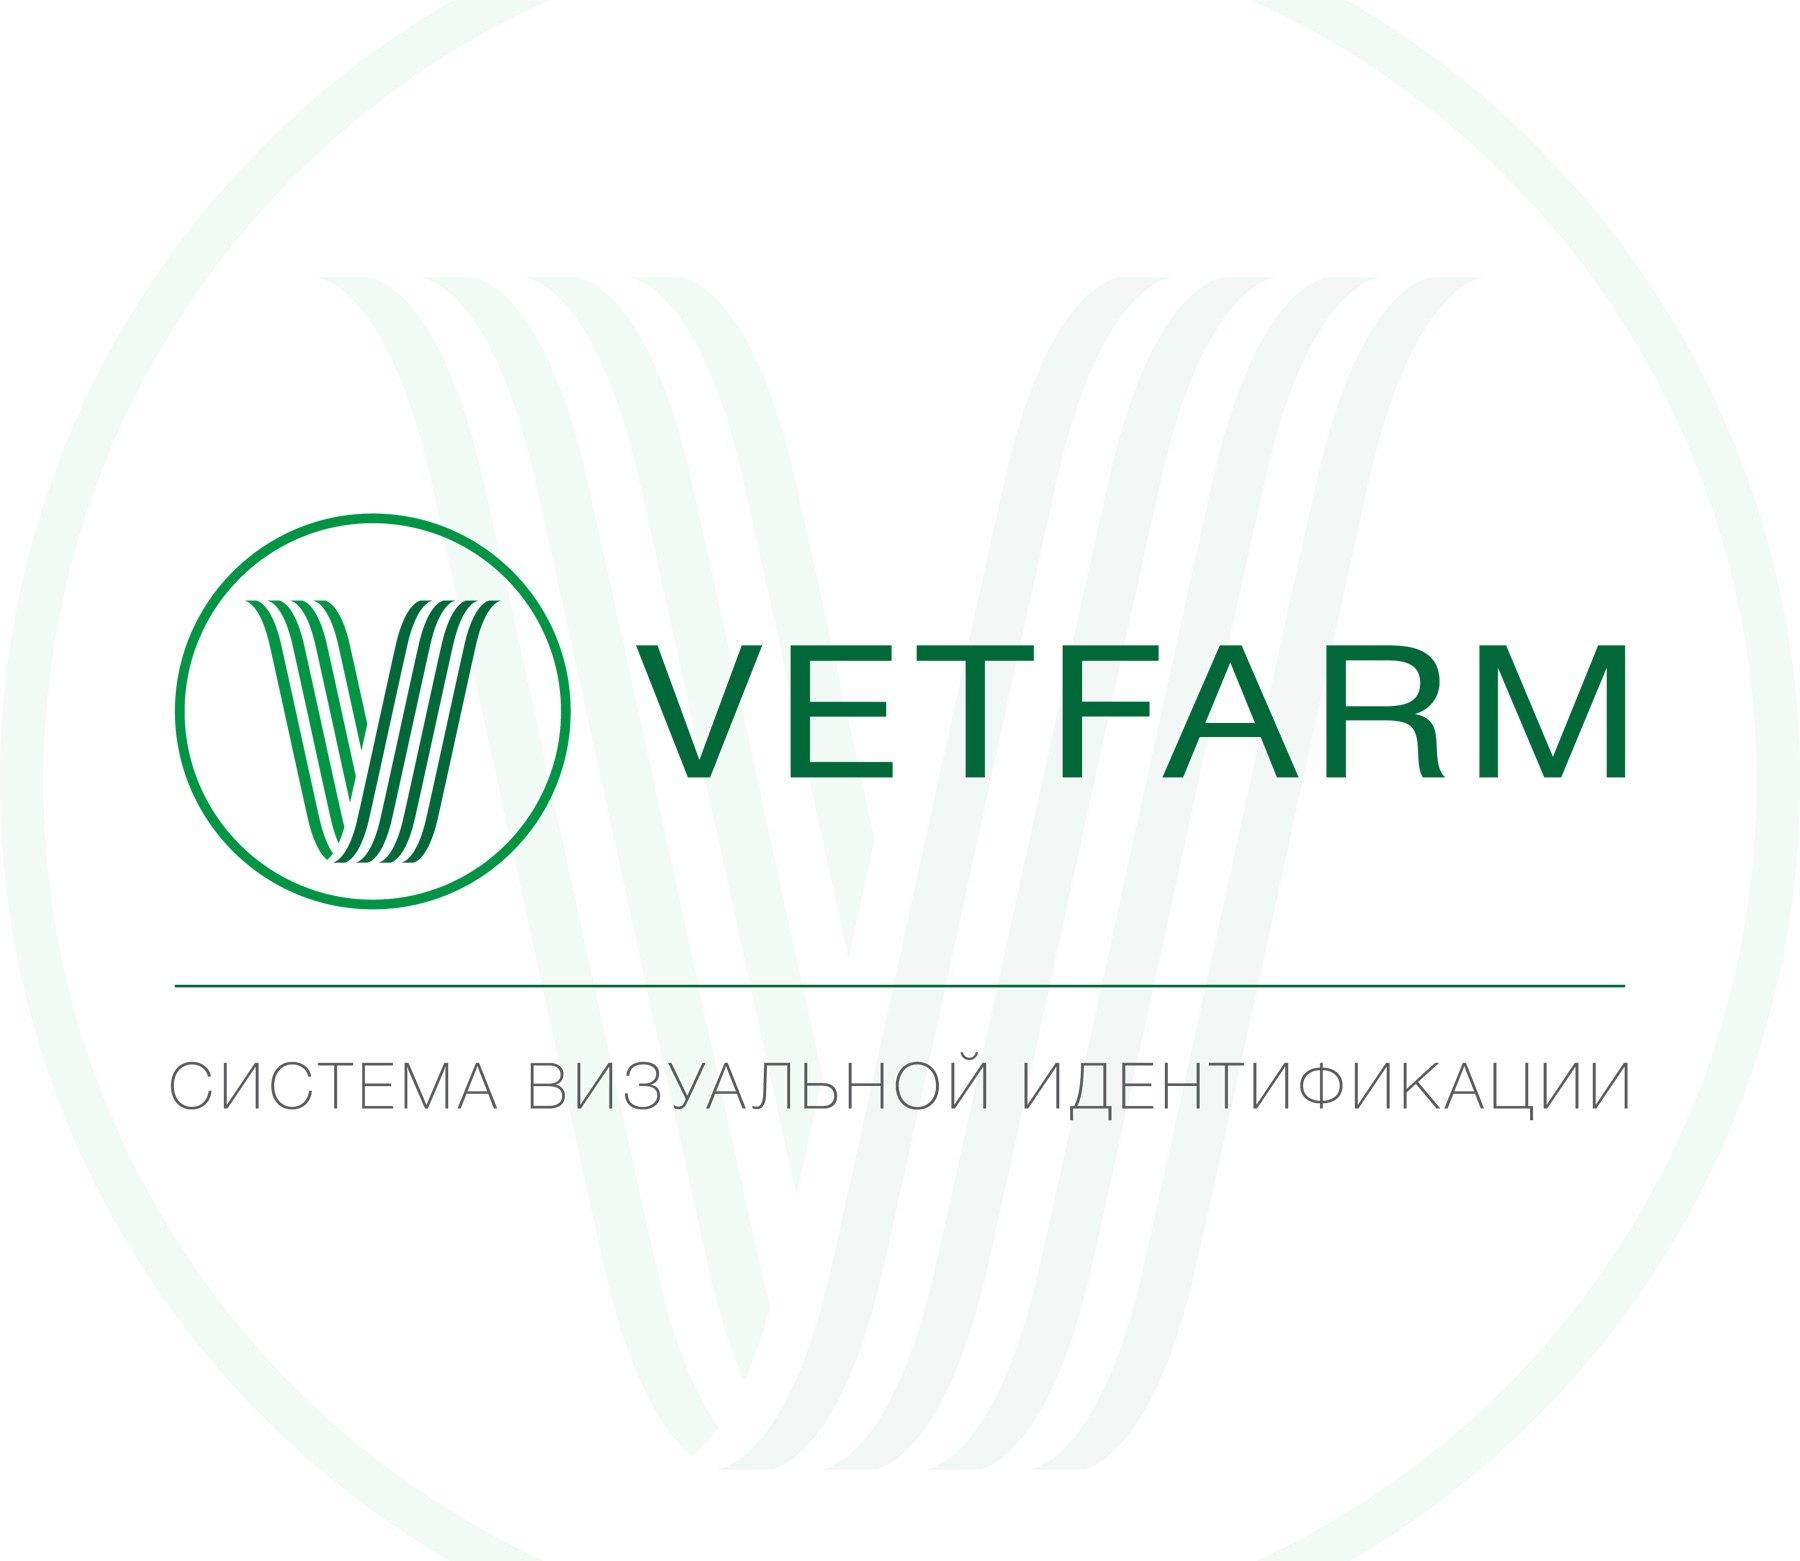 Brandbook development for Vetfarm company – manufacture, import and distribution of veterinary products portfolio